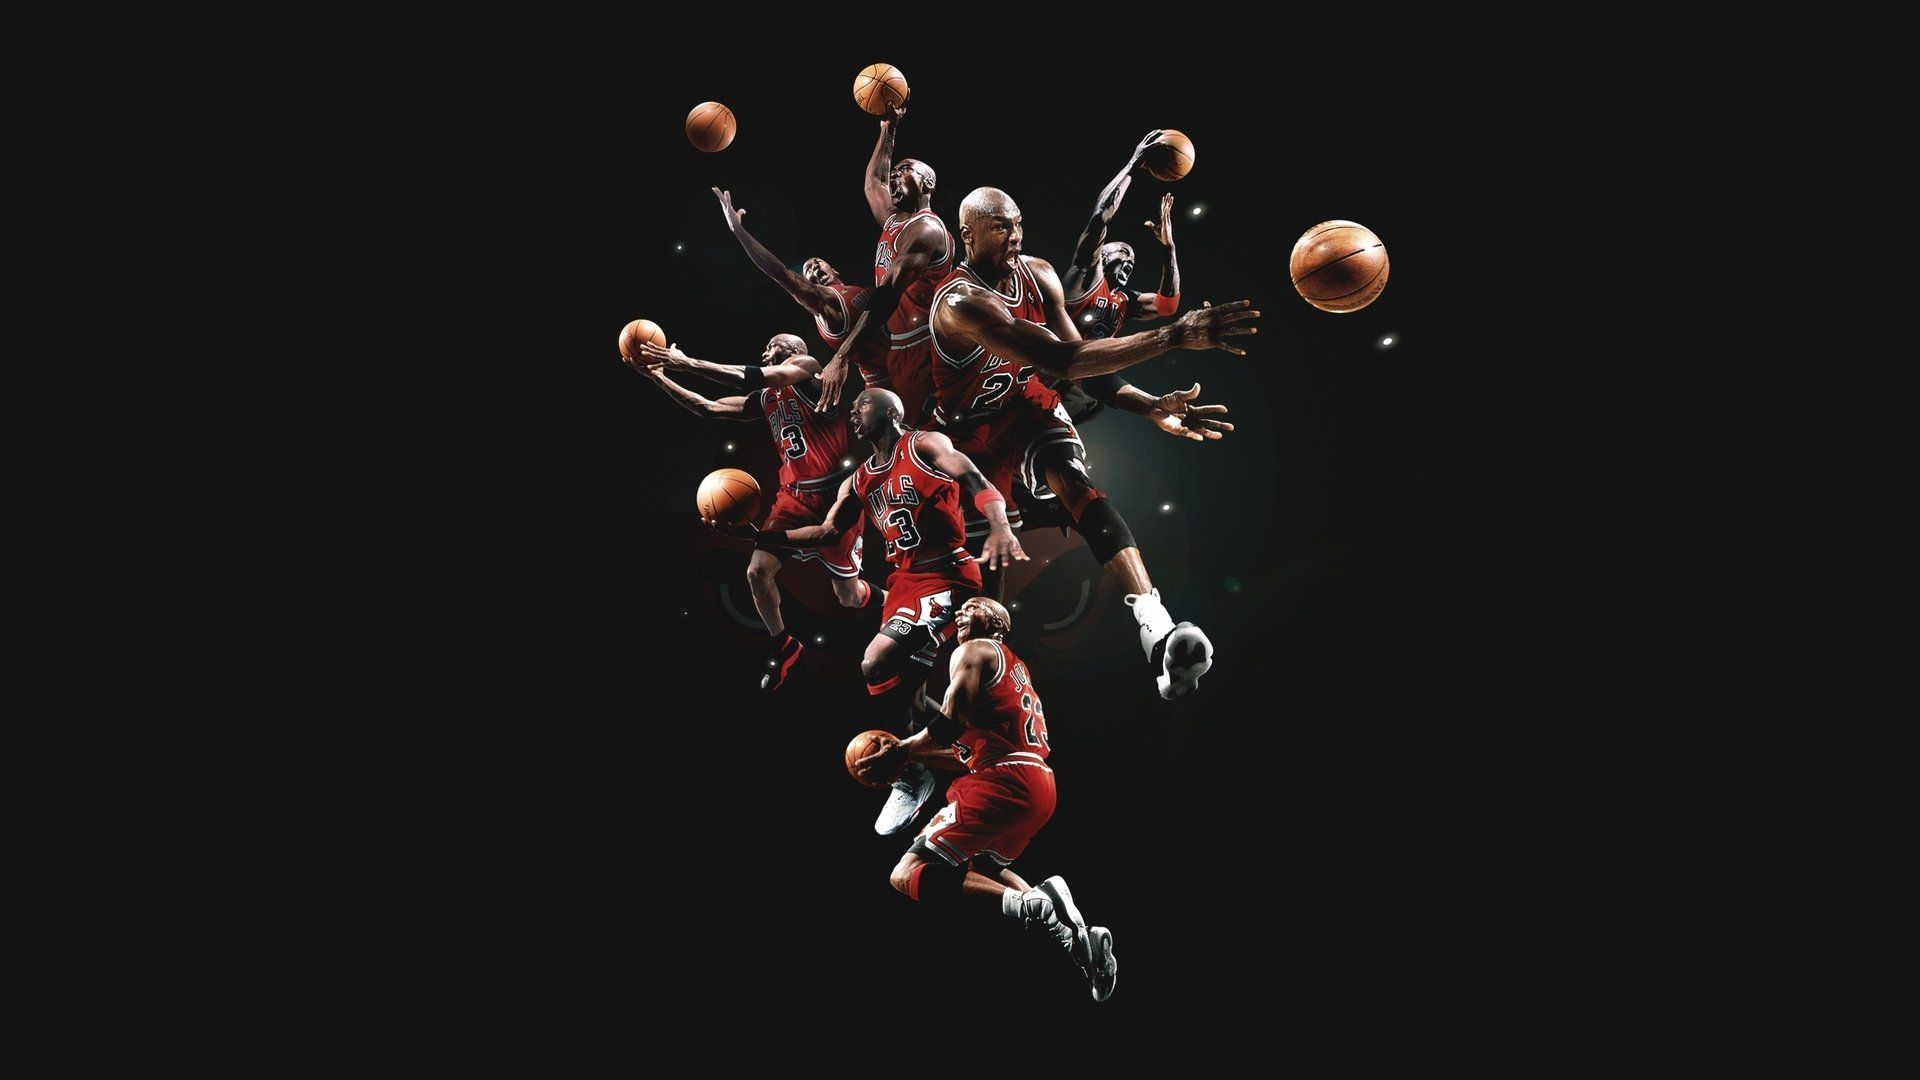 Michael Jordan Dunk Wallpaper | Dope | Pinterest | Air jordan ...